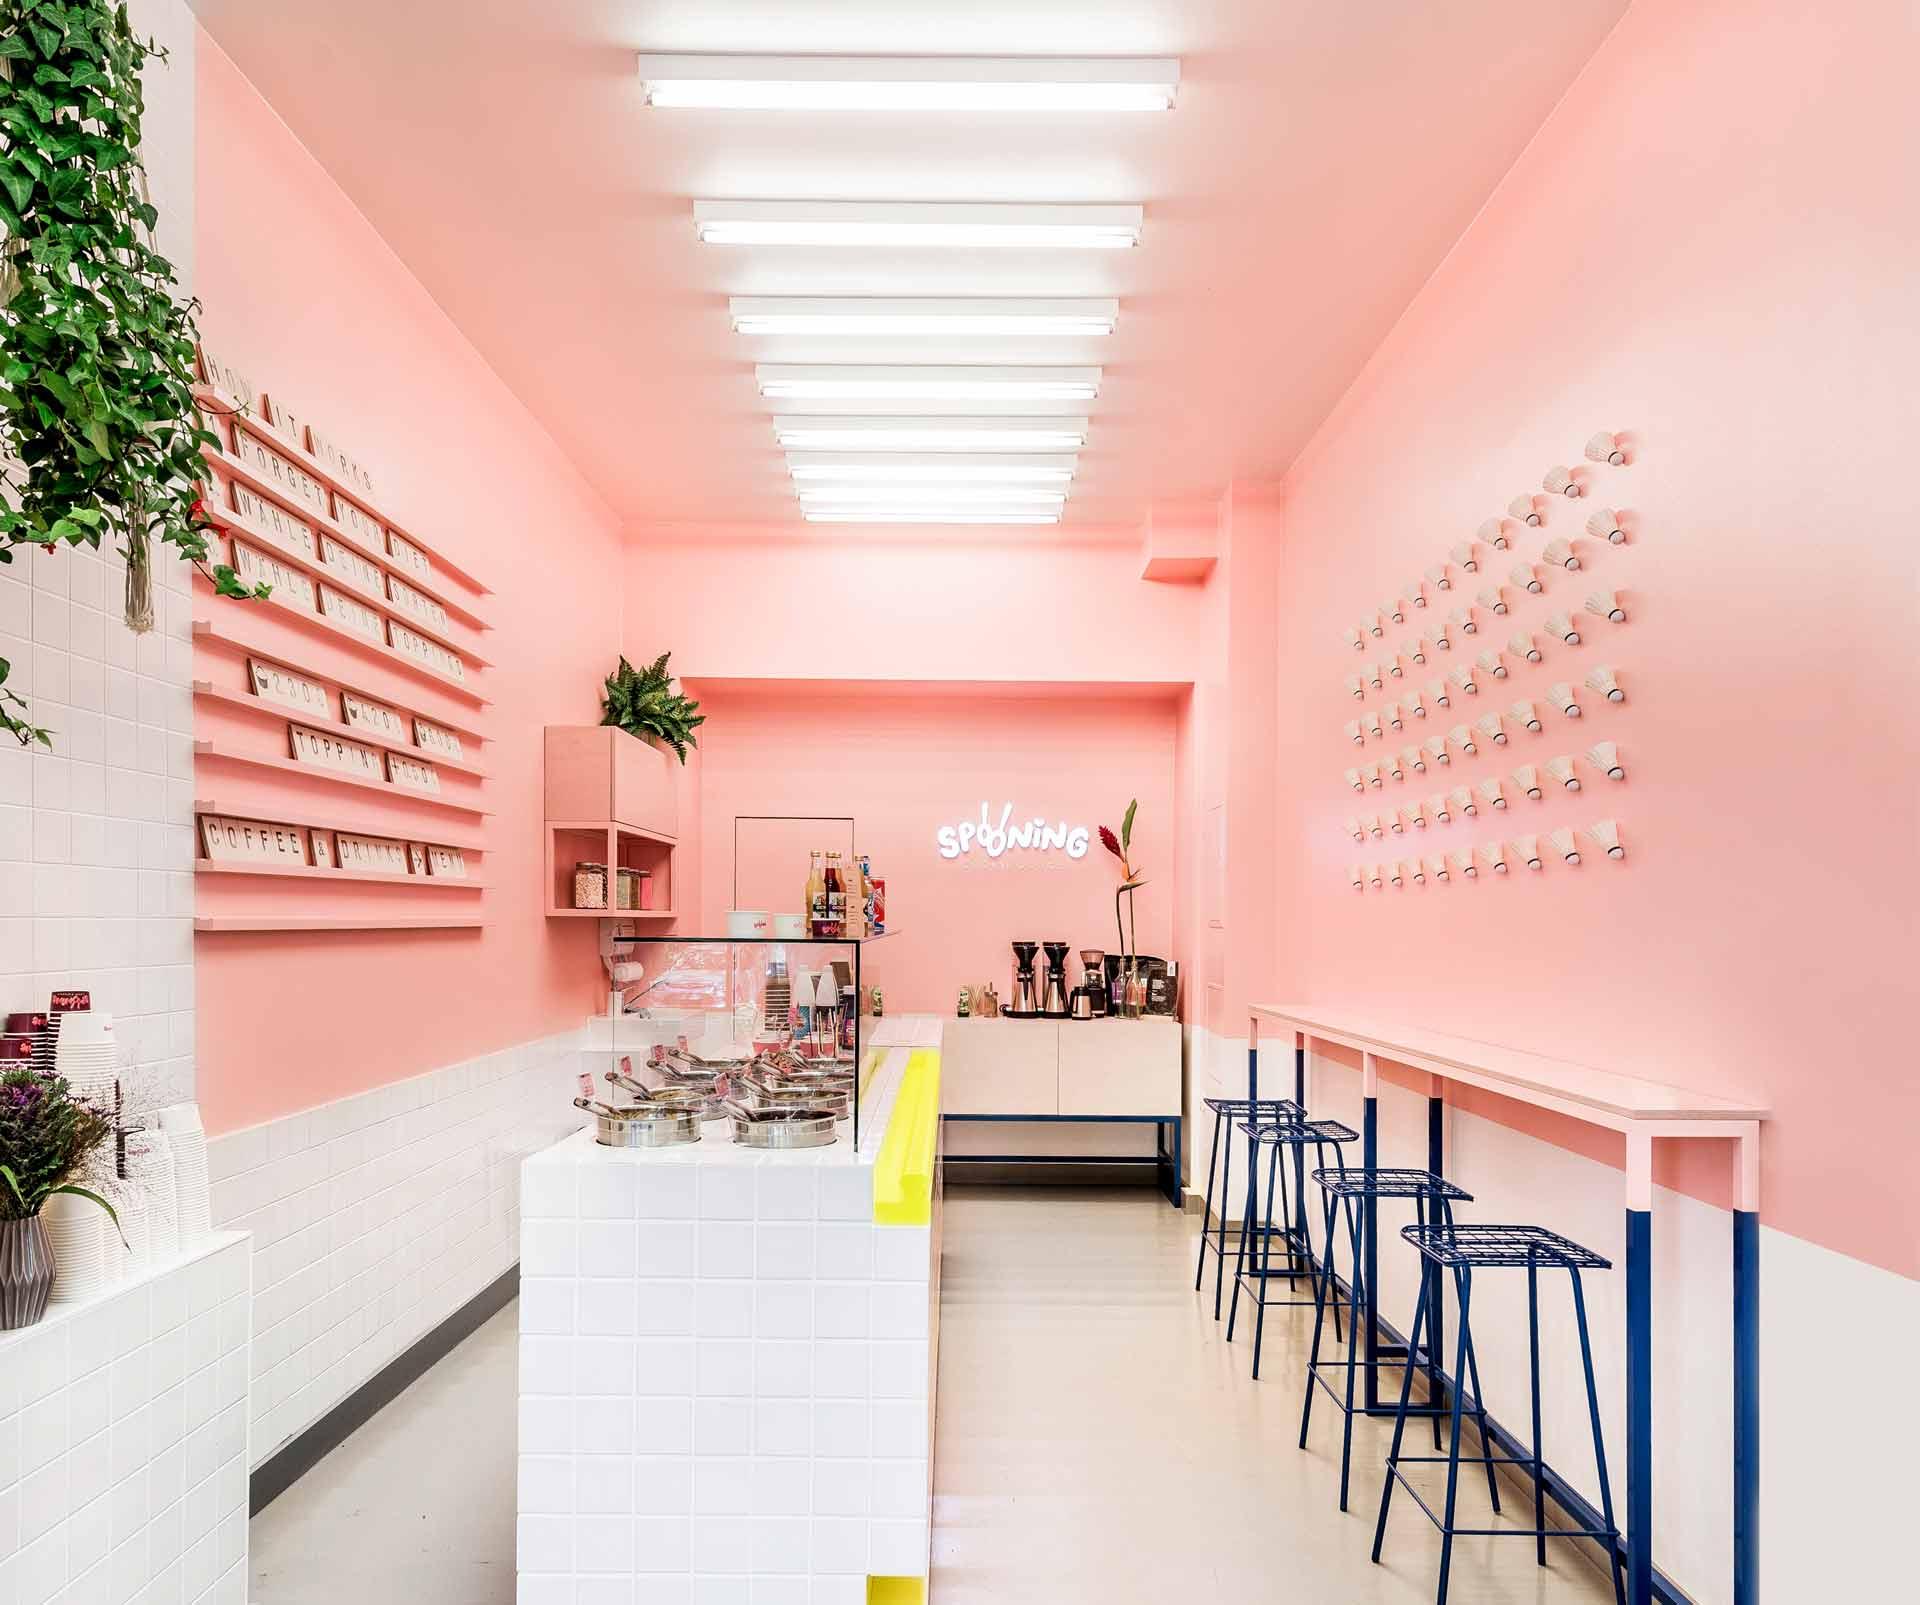 Zentralnorden Case: Spooning Cookie Dough Interior Image Kollwitzplatz